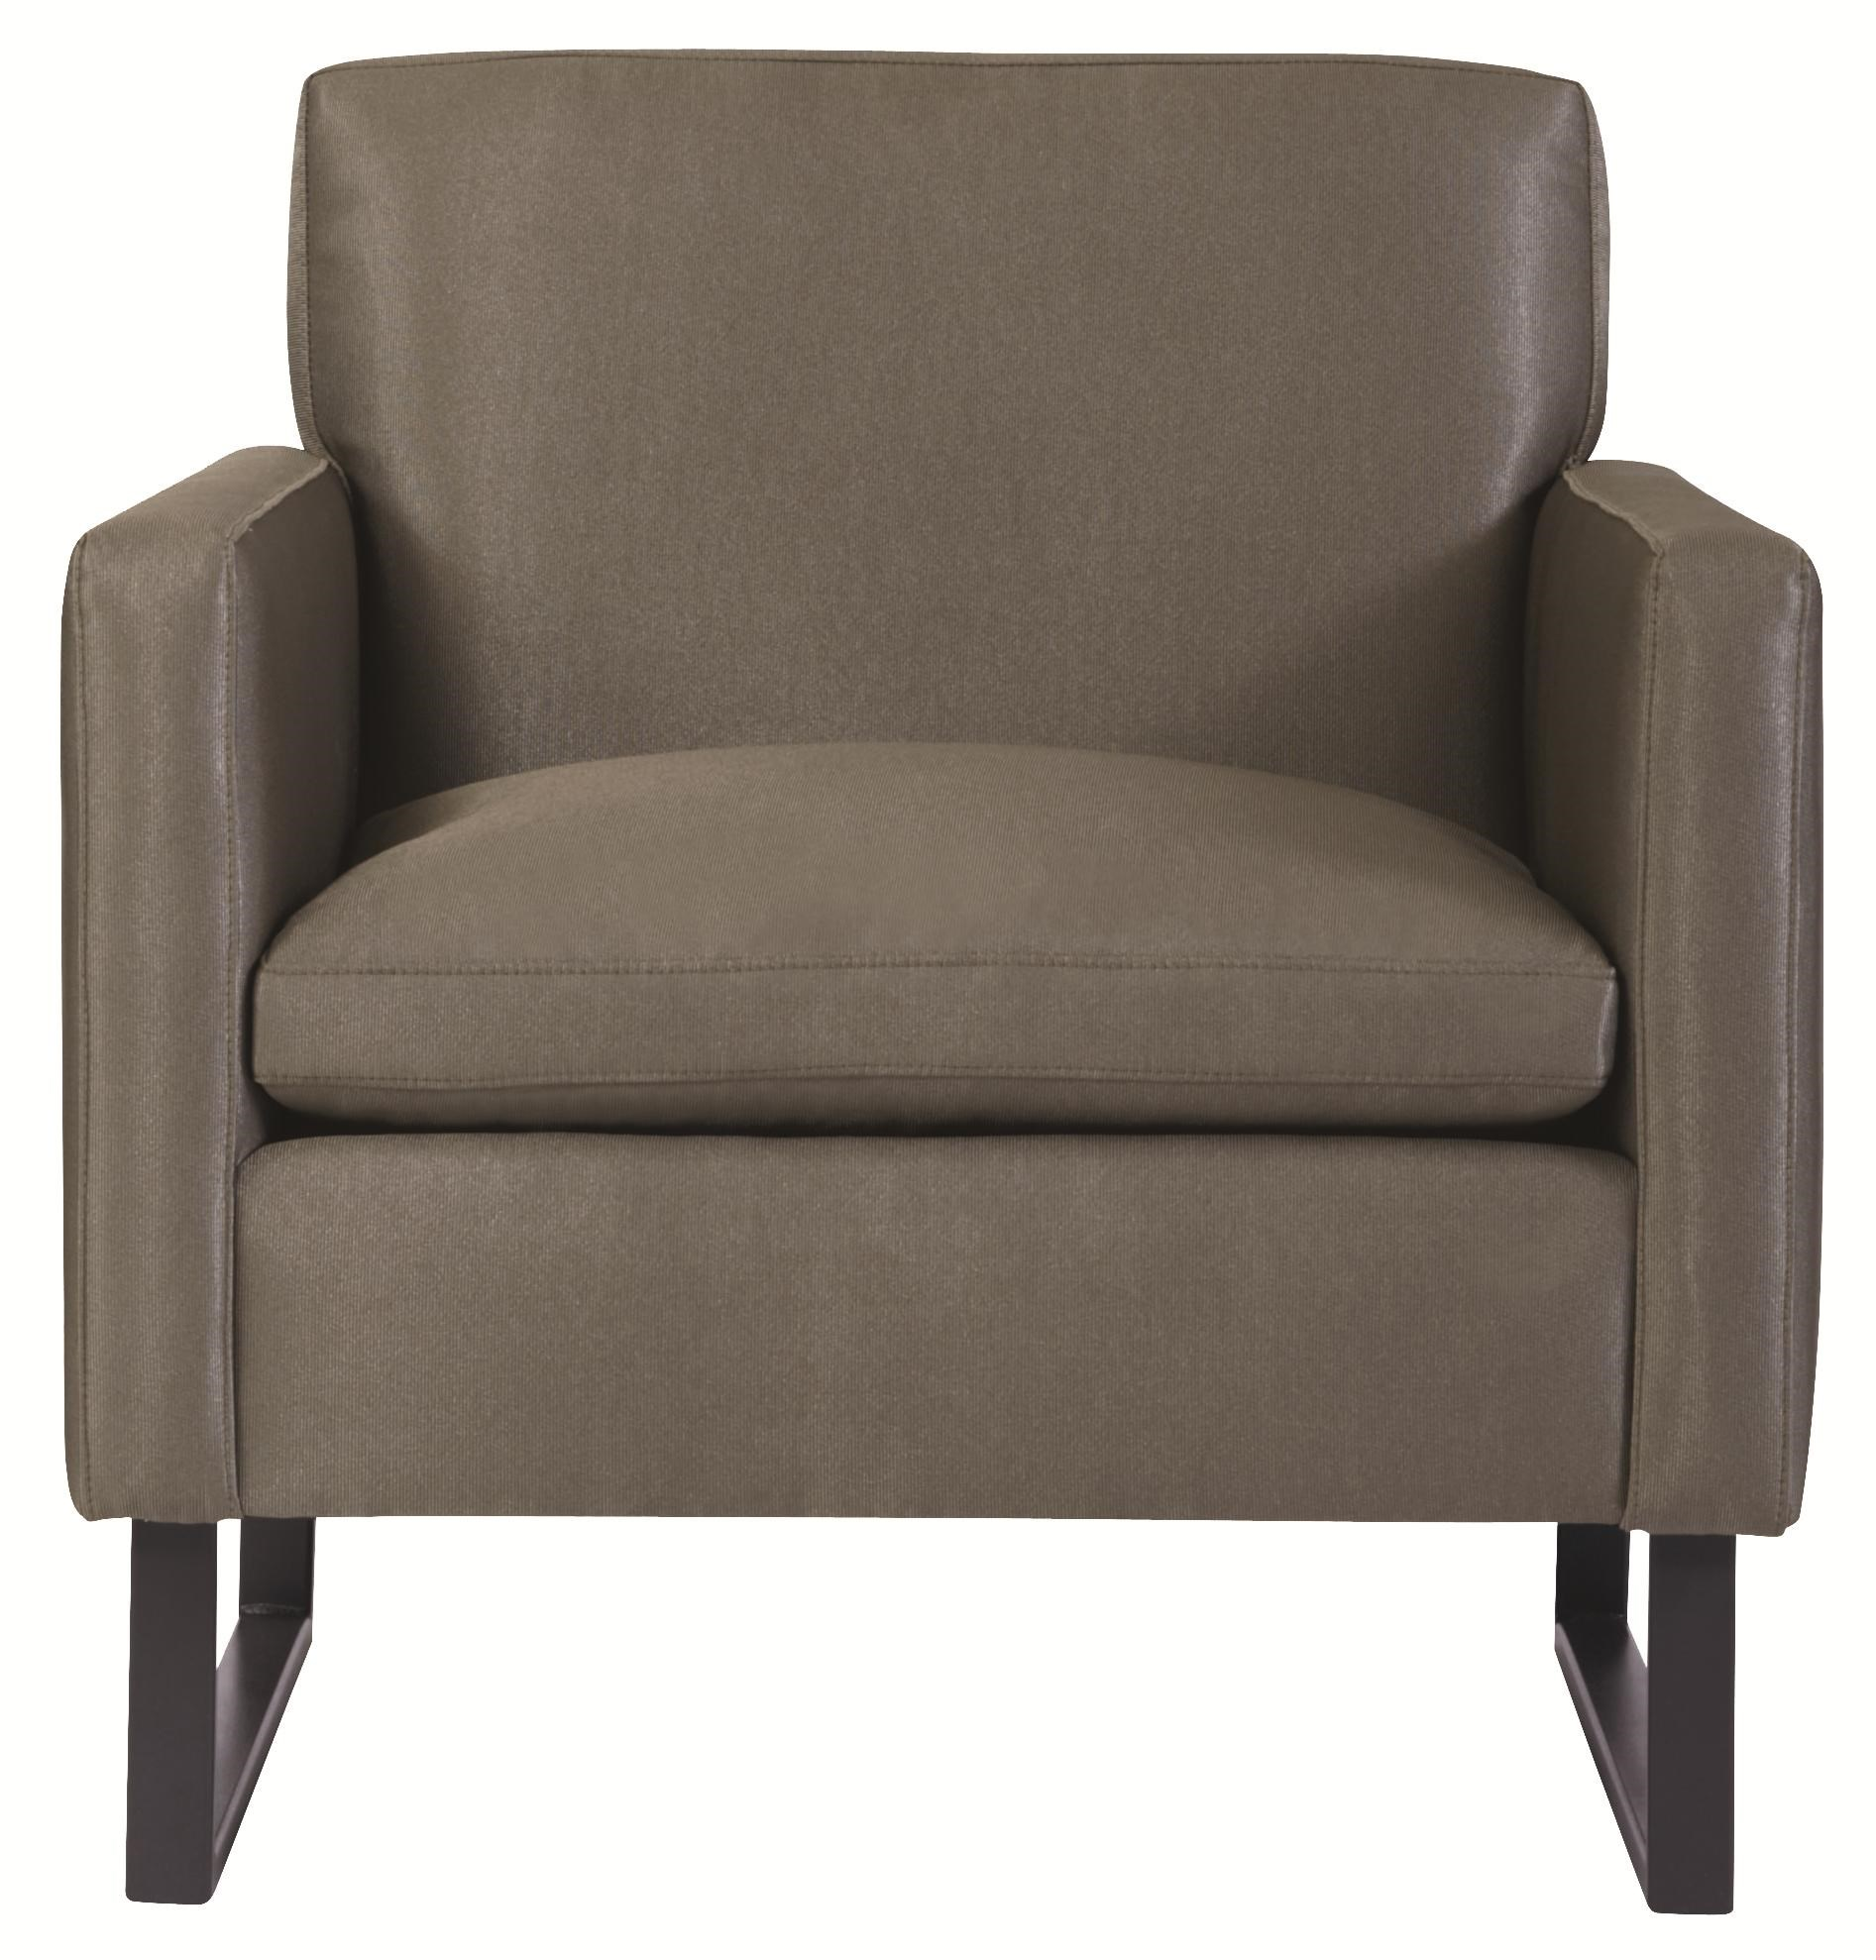 Bernhardt Interiors Chairs Modern Contemporary Jaxon